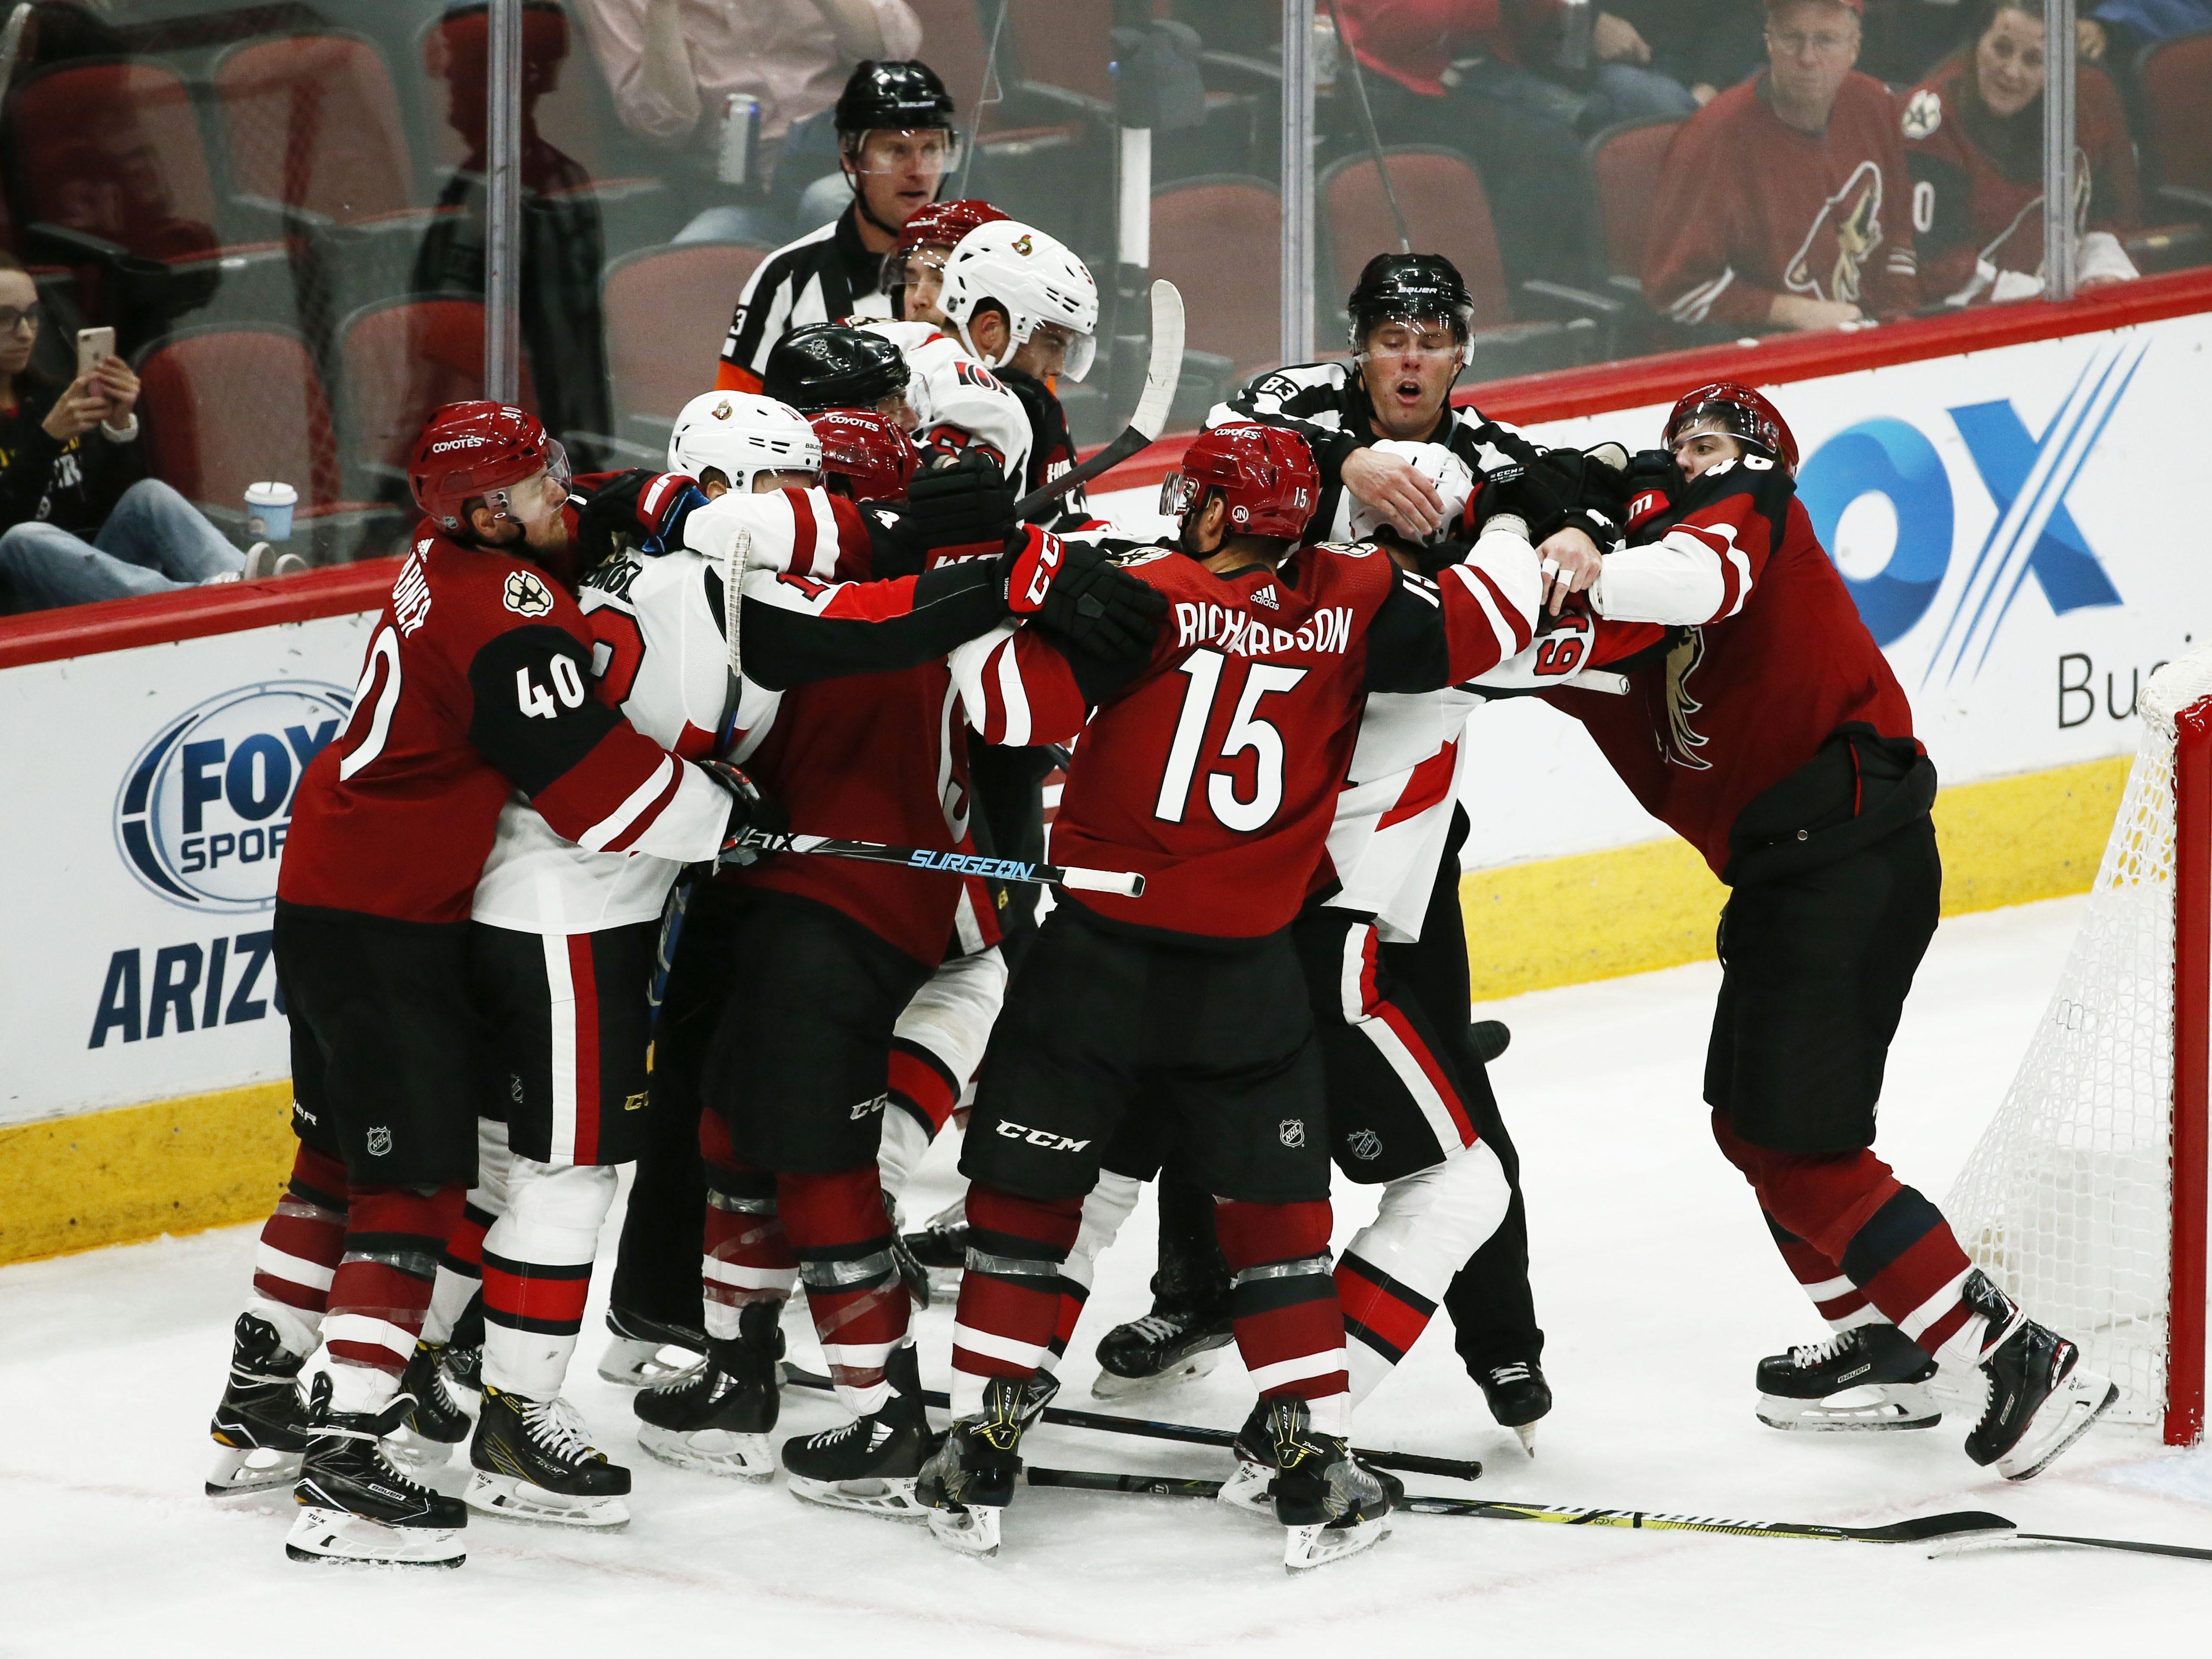 Arizona Coyotes' Ilya Lyubushkin fights with Ottawa Senators' Mark Stone in the third period on Oct. 30, 2018 at Gila River Arena.